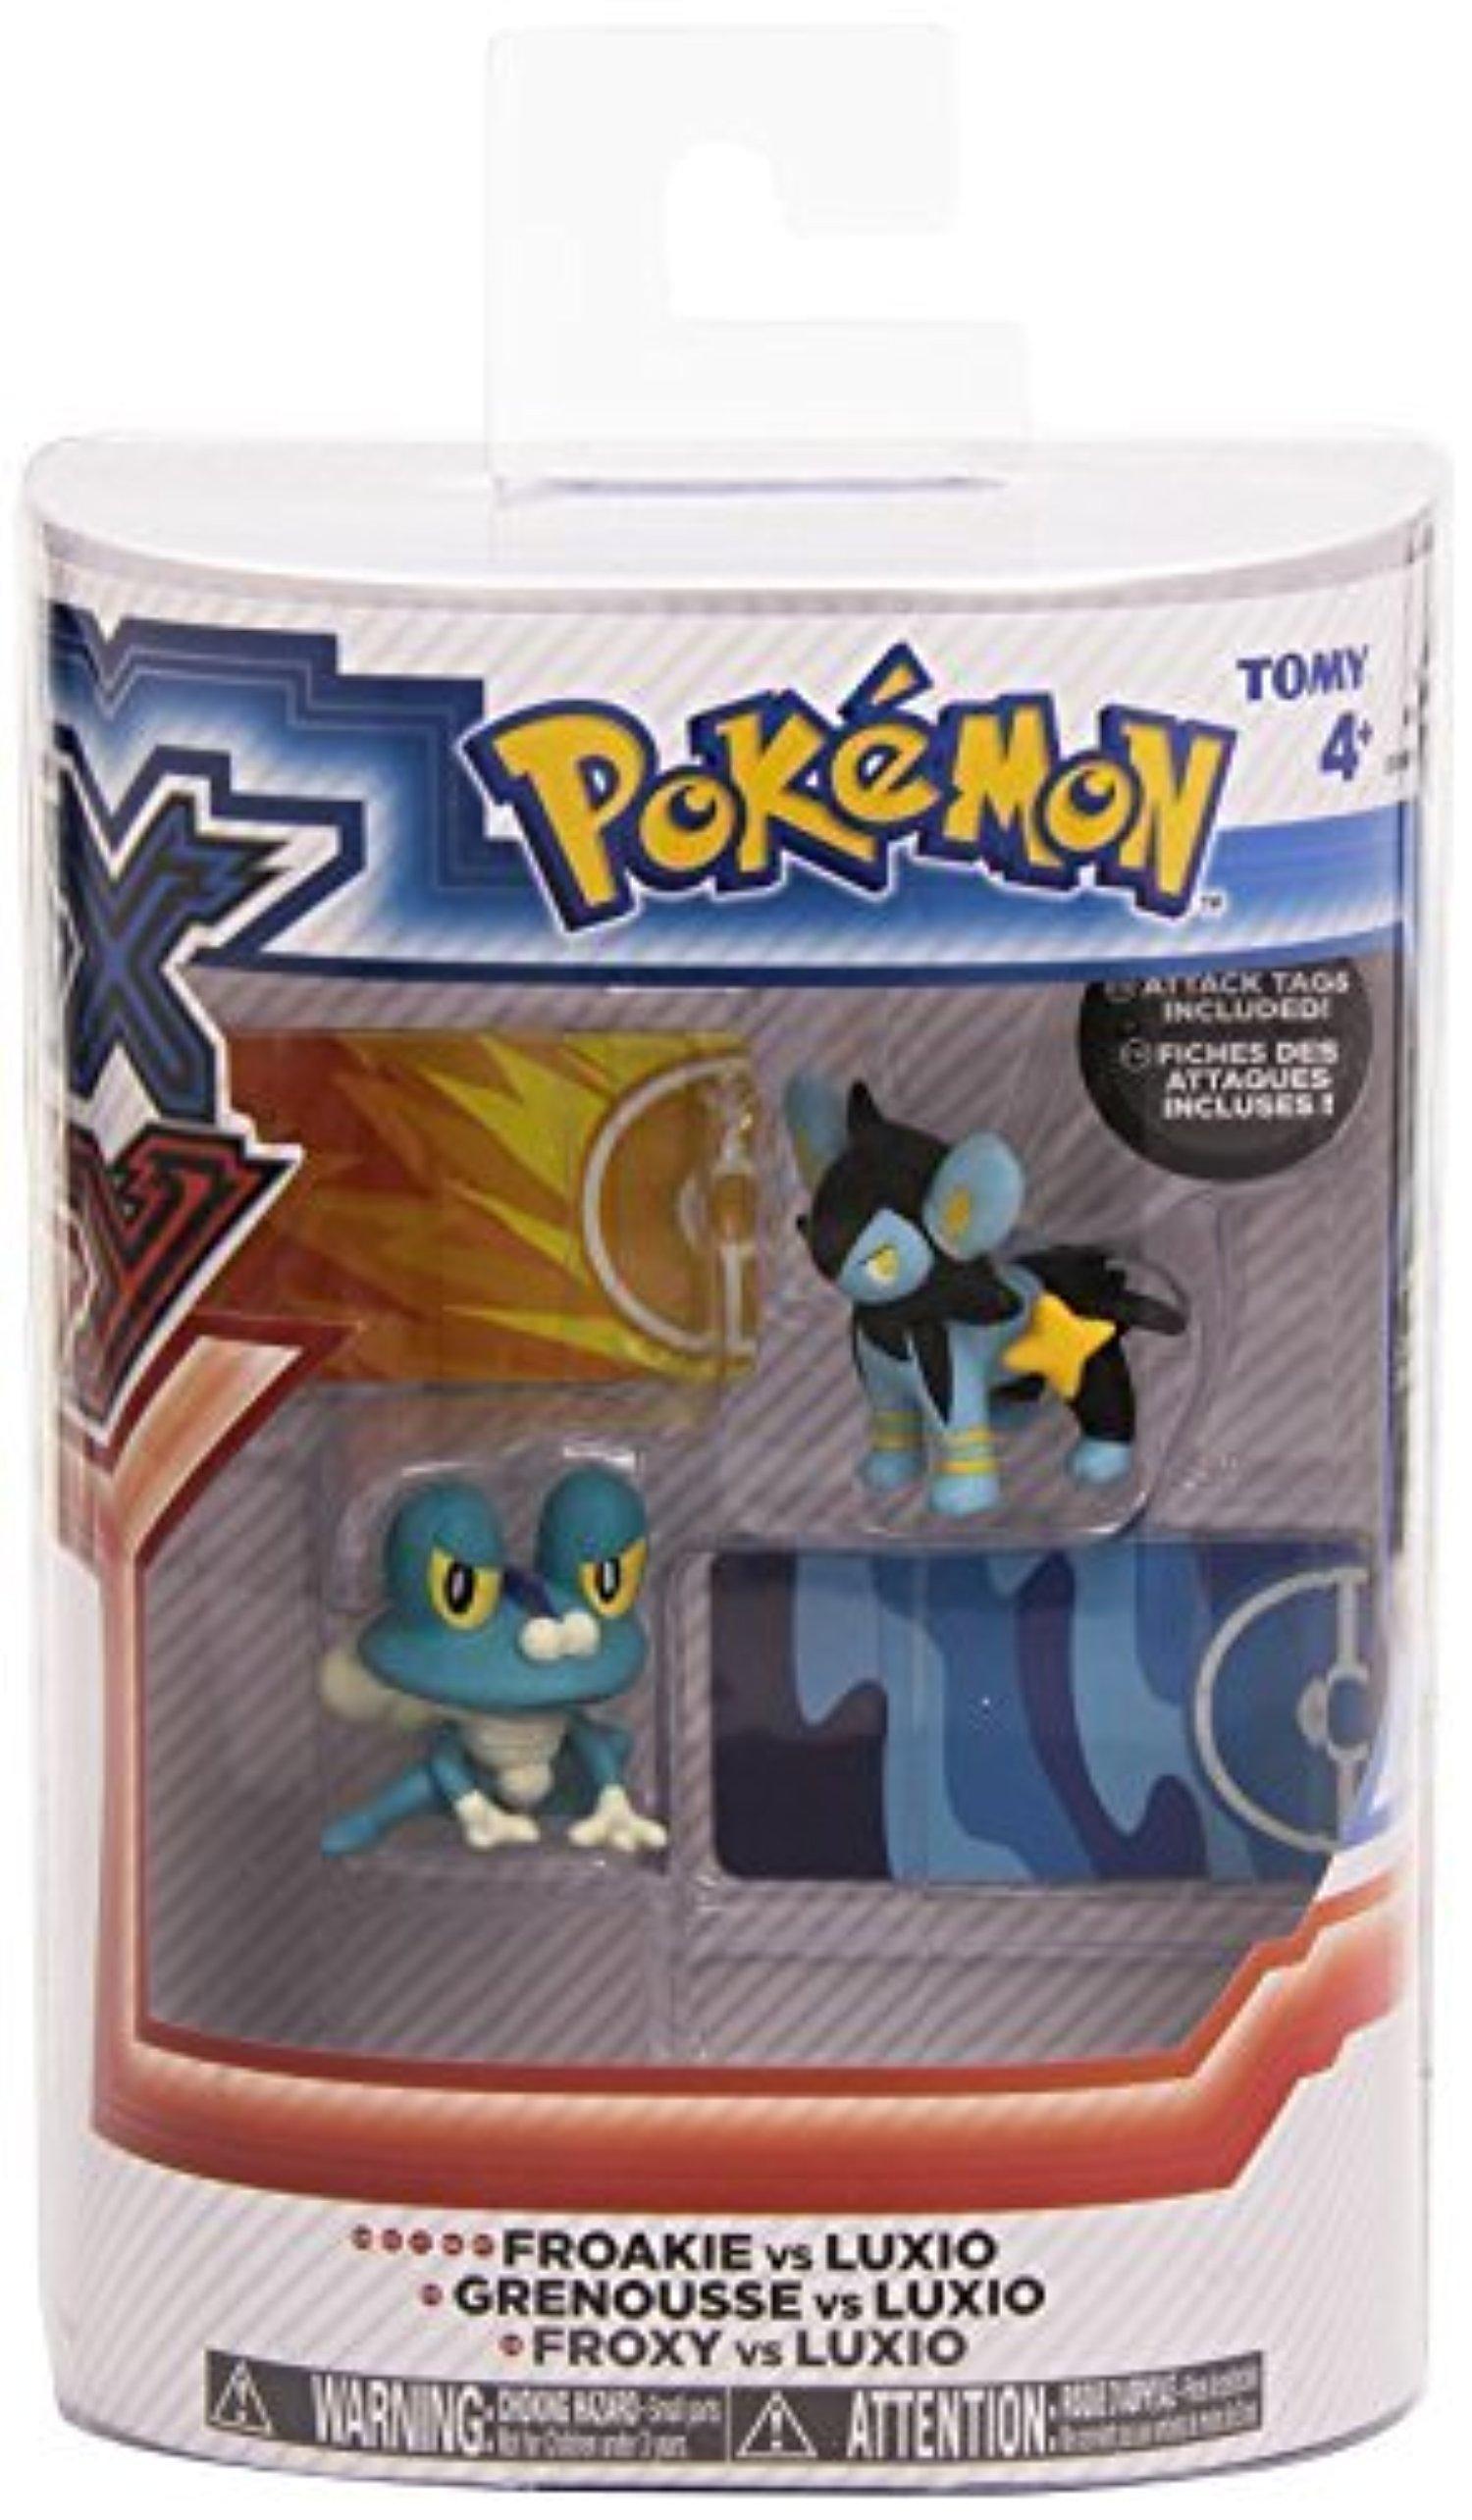 Tomy International Pokemon X & Y: Pikachu vs Flareon Action Figure (2 Pack) by Tomy International